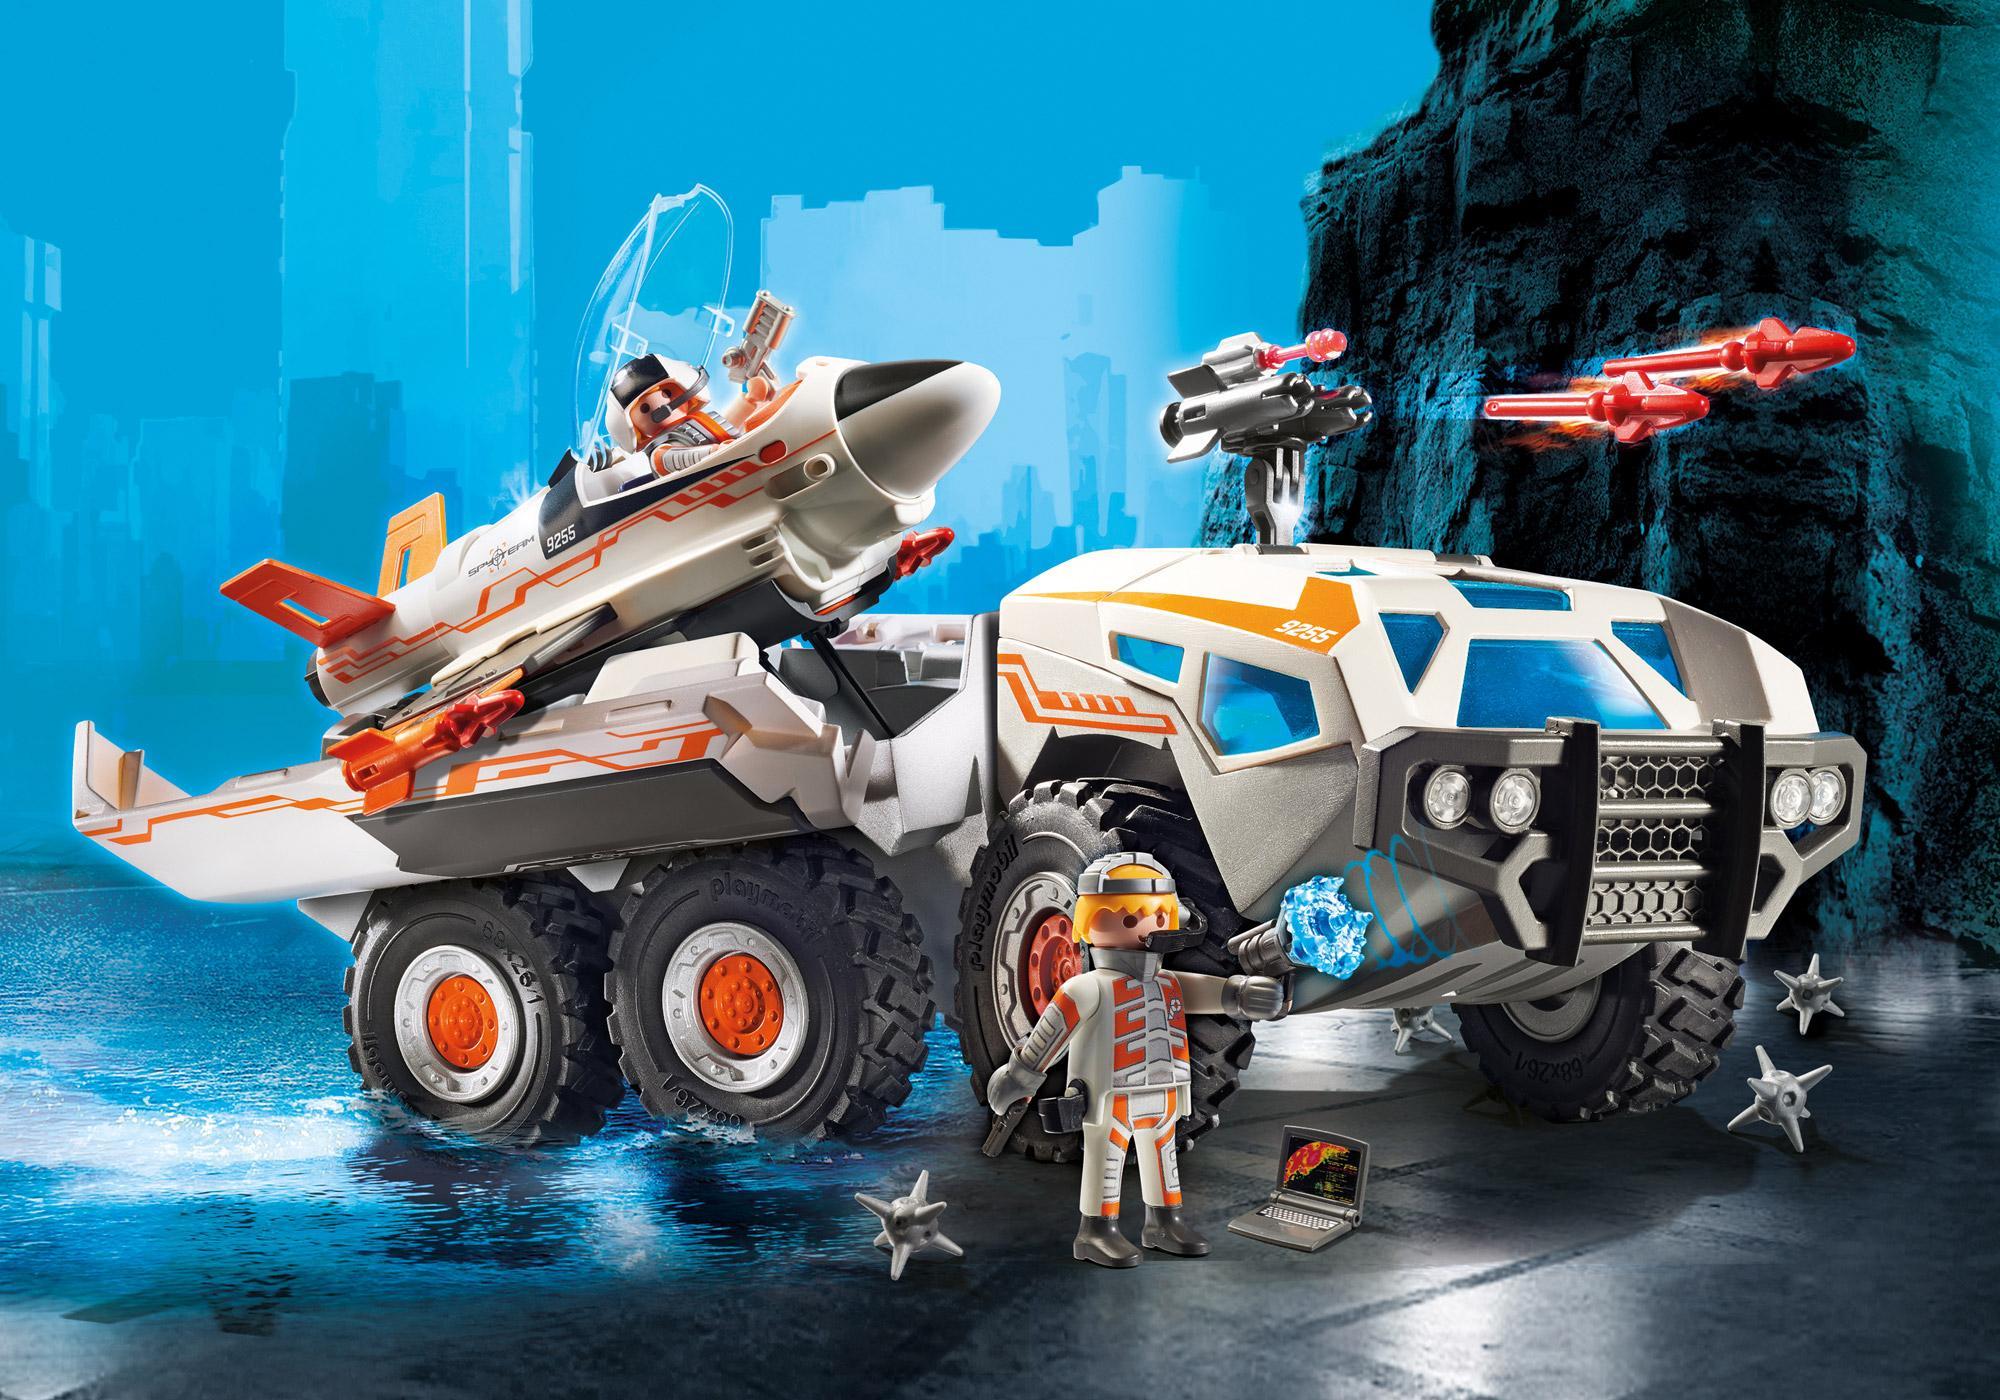 9255_product_detail/Spy Team Battle Truck